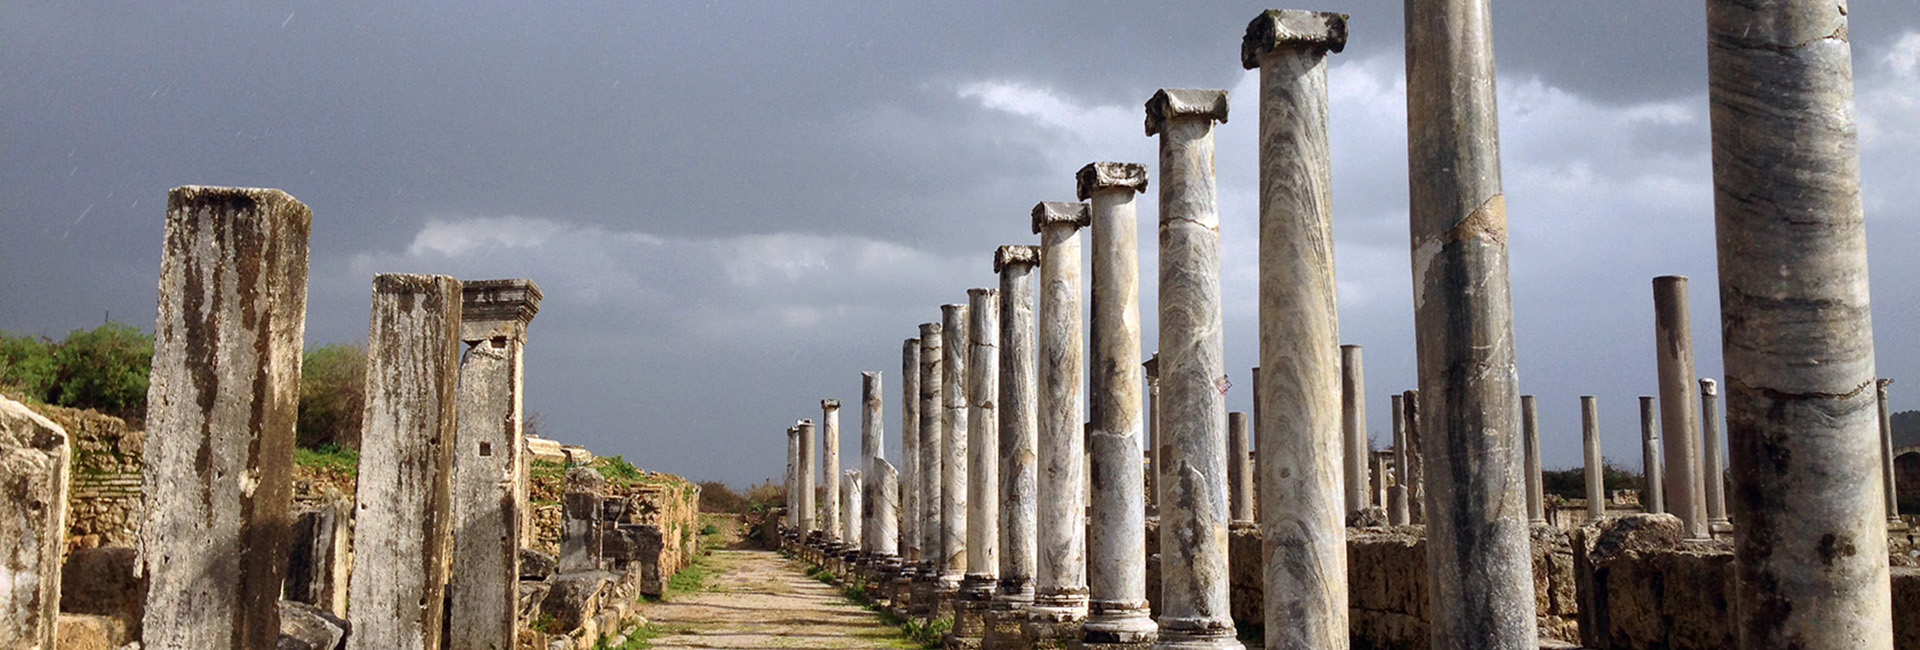 Yurtiçi Arkeoloji Gezileri: Perge